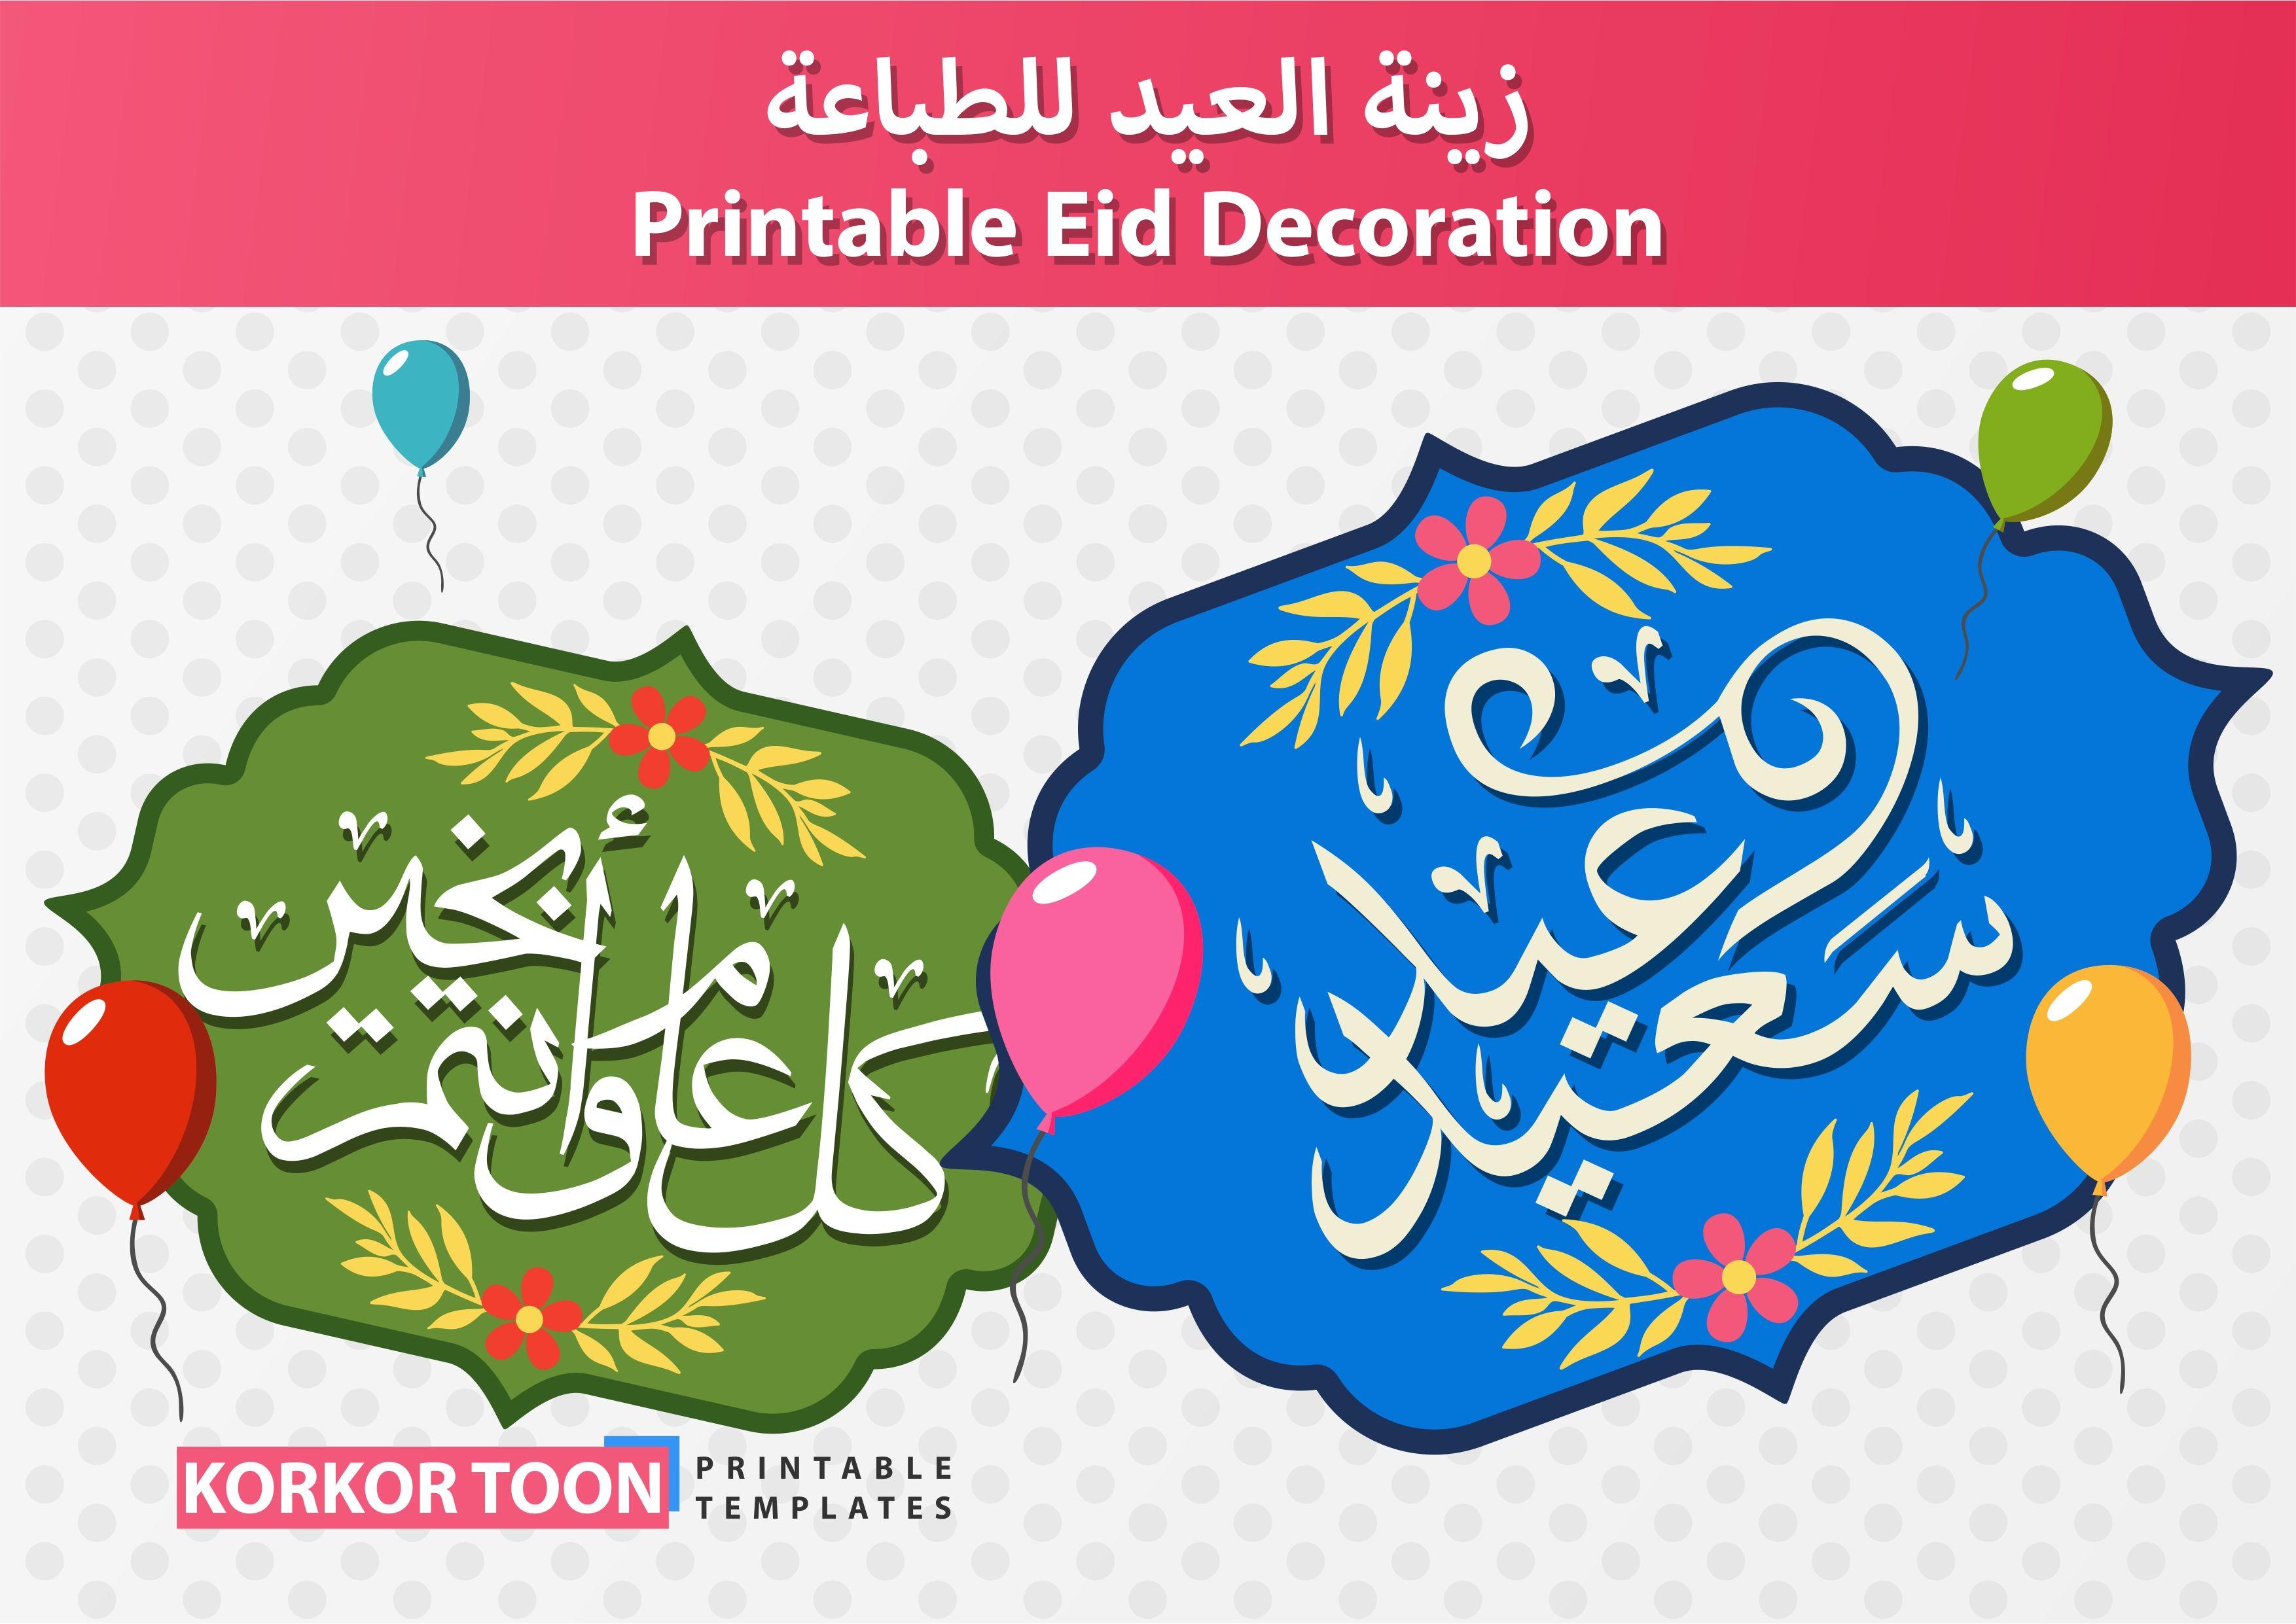 Printable Eid Decoration زينة العيد للطباعة Eid Decoration Kids Worksheets Printables Template Printable